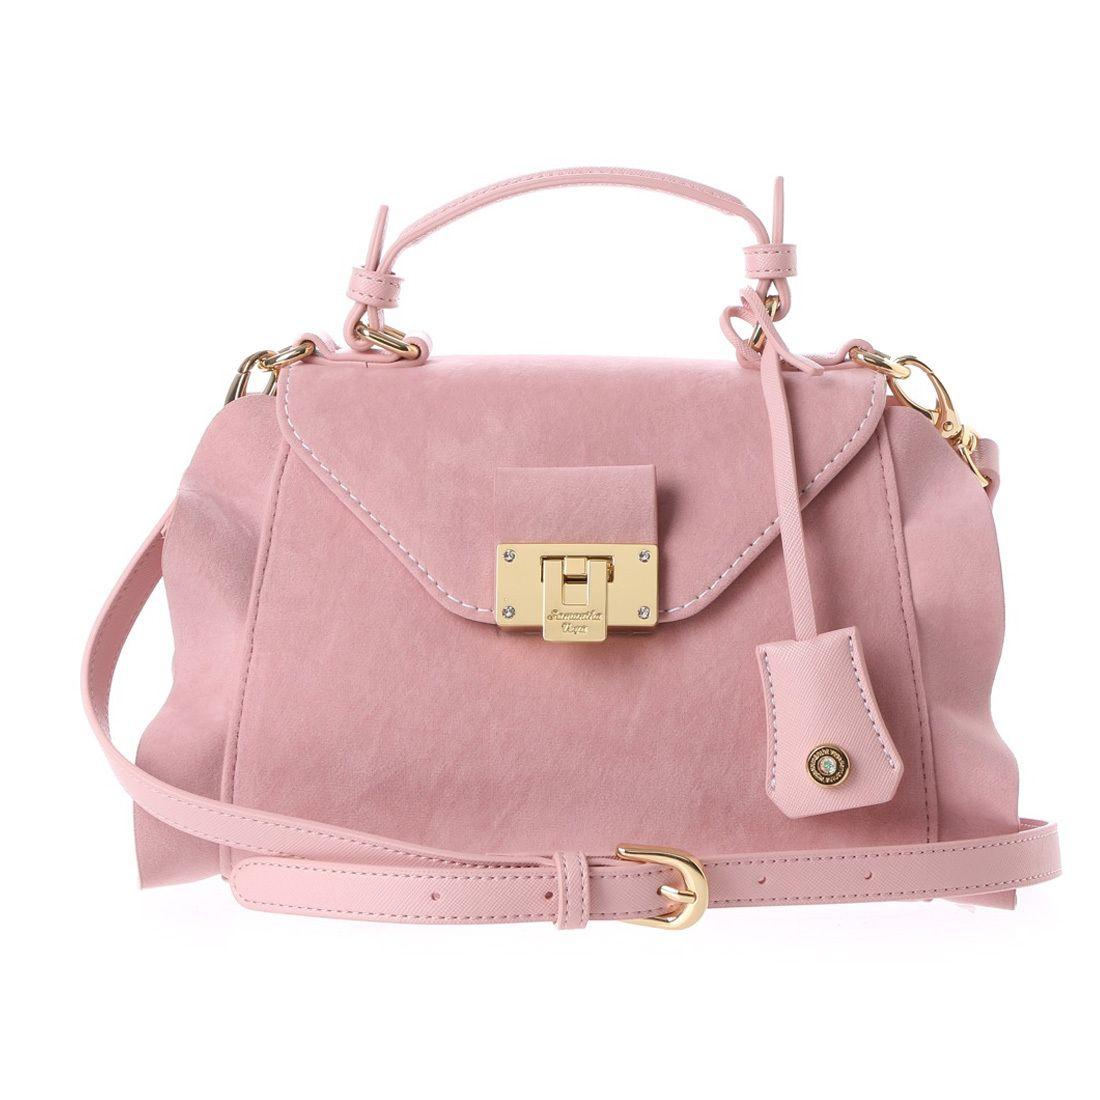 53ce7c33adb4 Samantha Thavasa サマンサベガ フリルベルベットレフィ(ピンク) -靴とファッションの通販サイト ロコンド